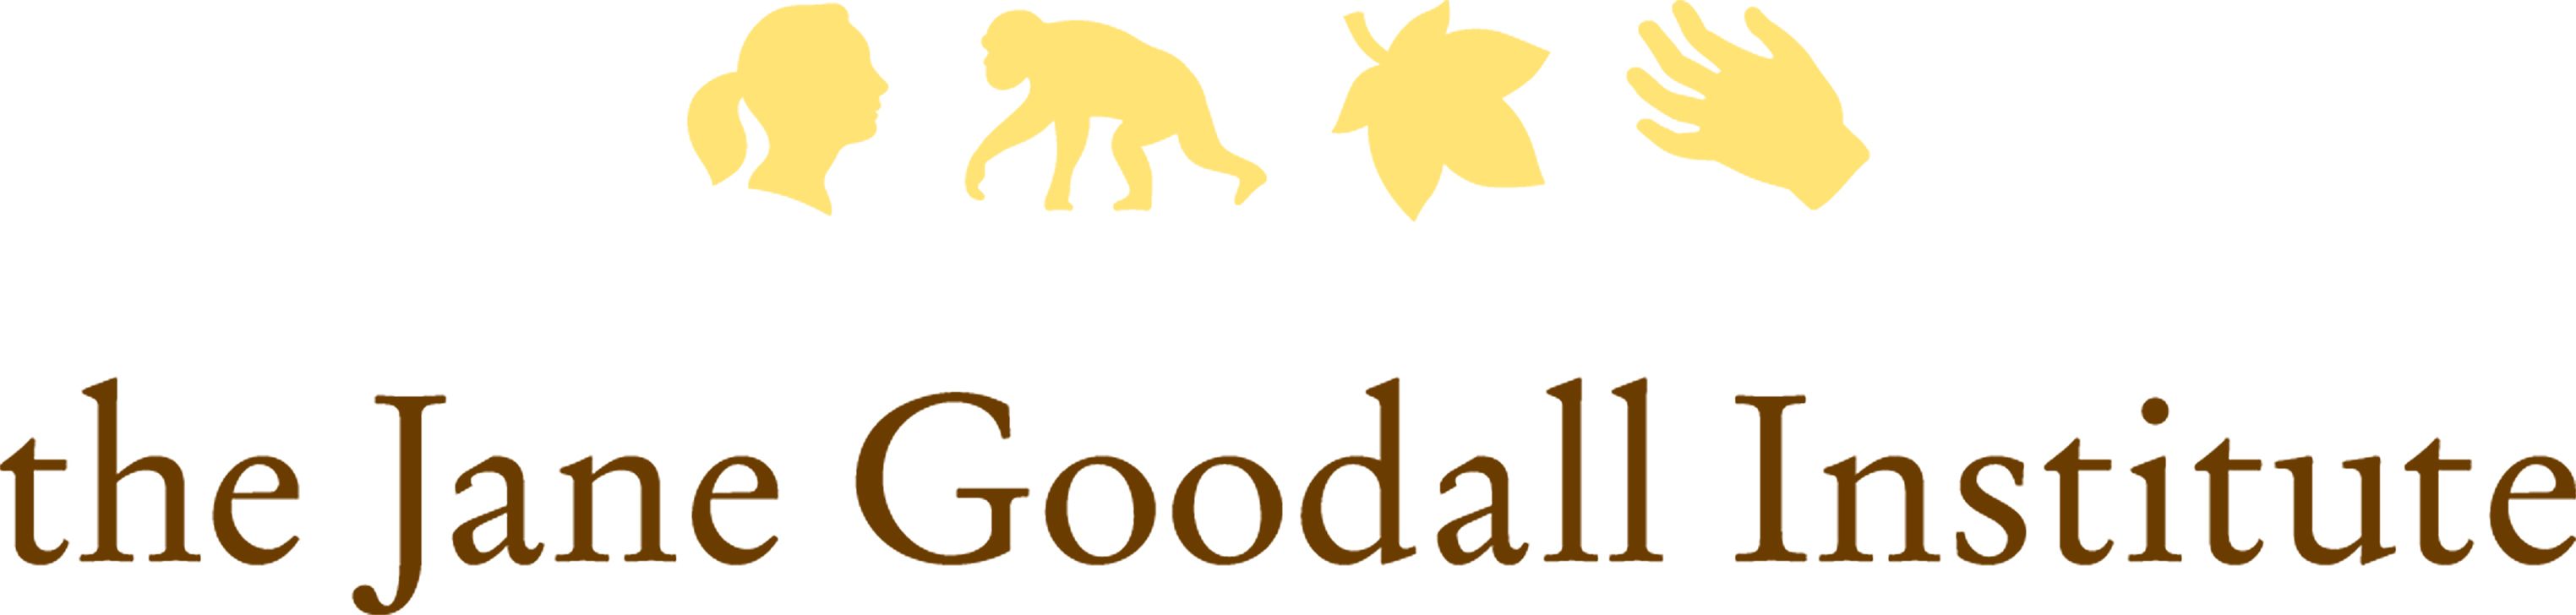 The Jane Goodall Institute logo